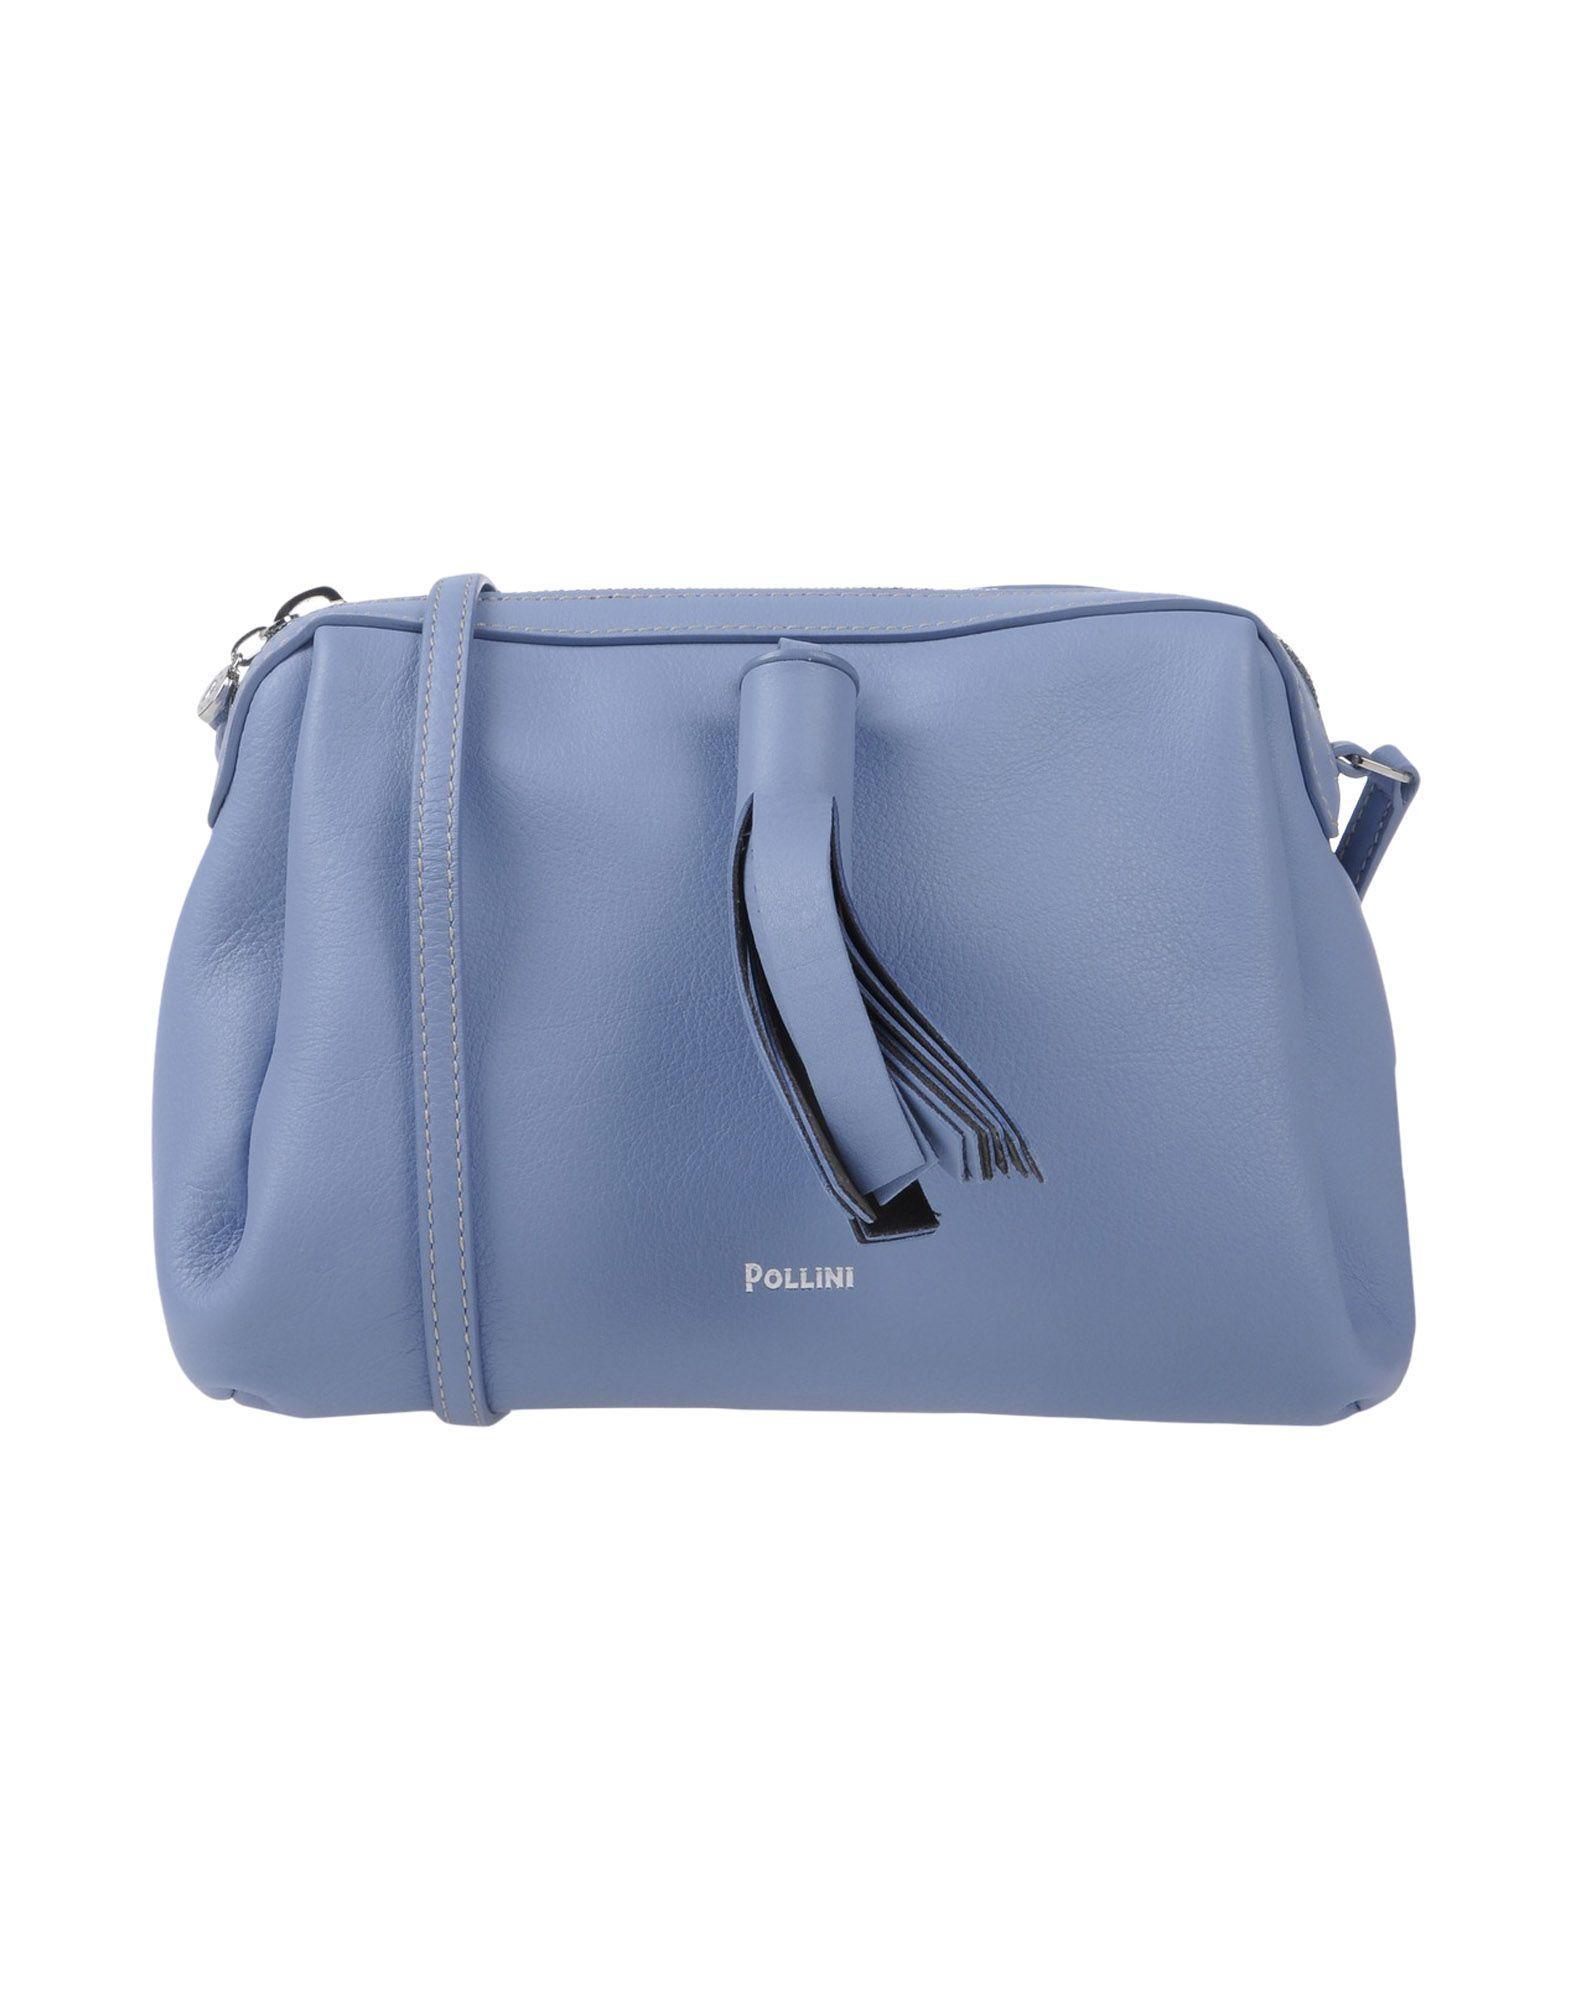 Pollini Handbags In Lilac